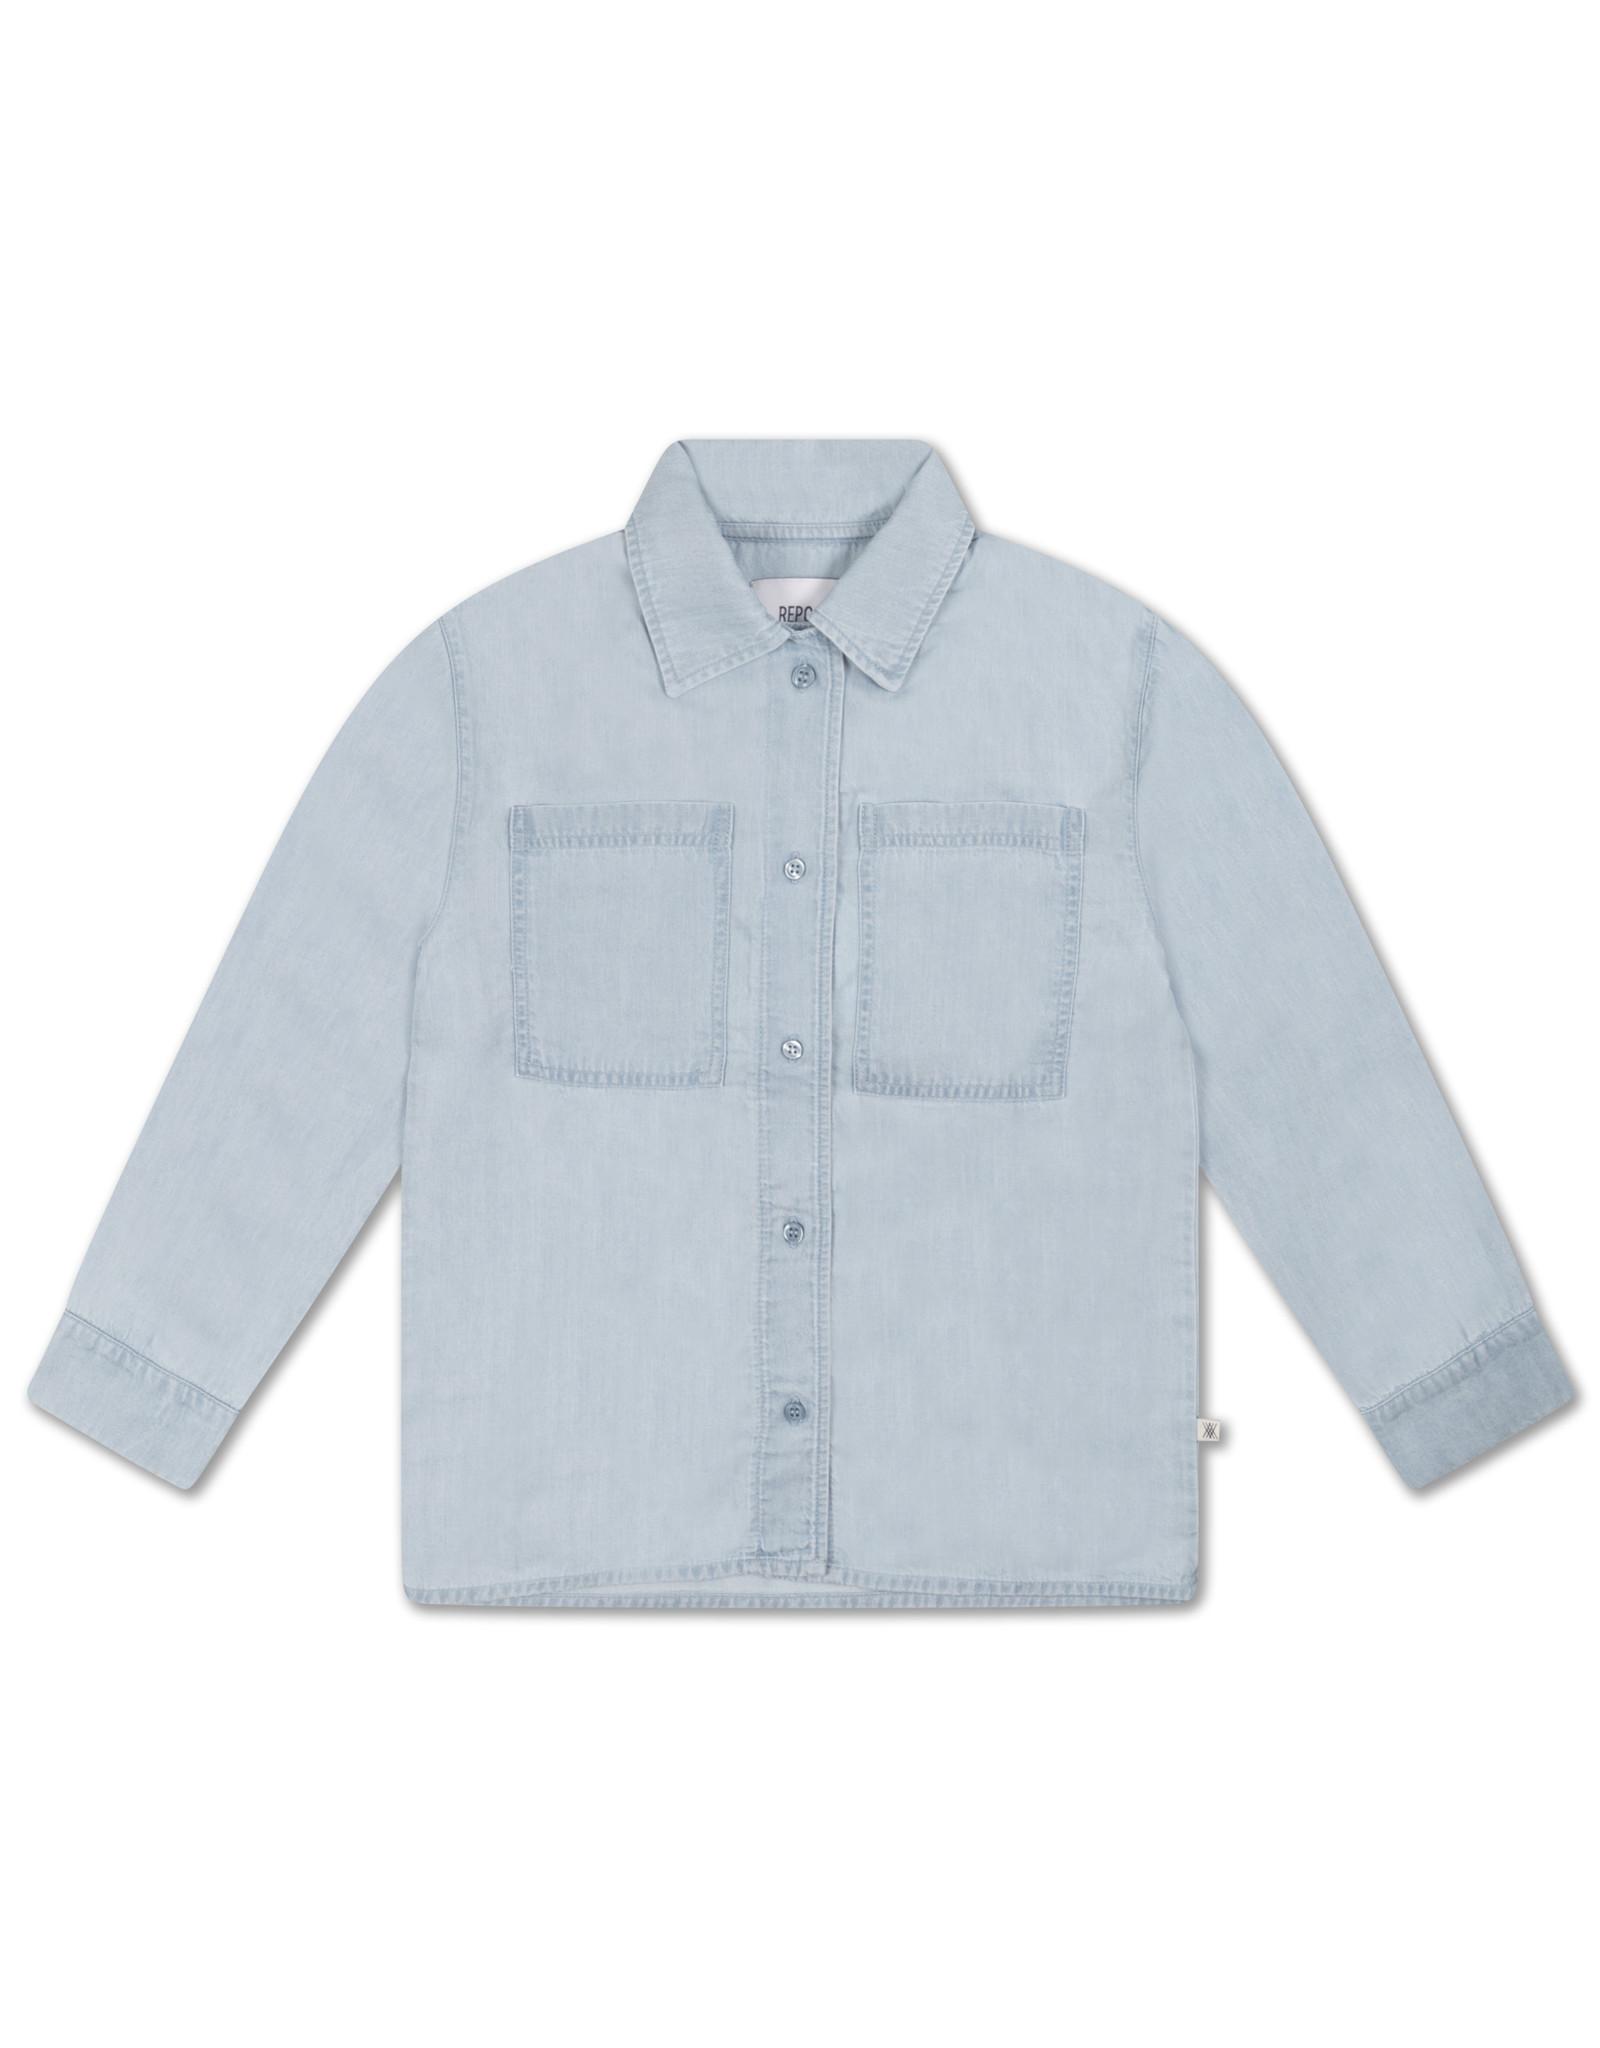 Repose Repose SS21 38 Classic Shirt light washed blue